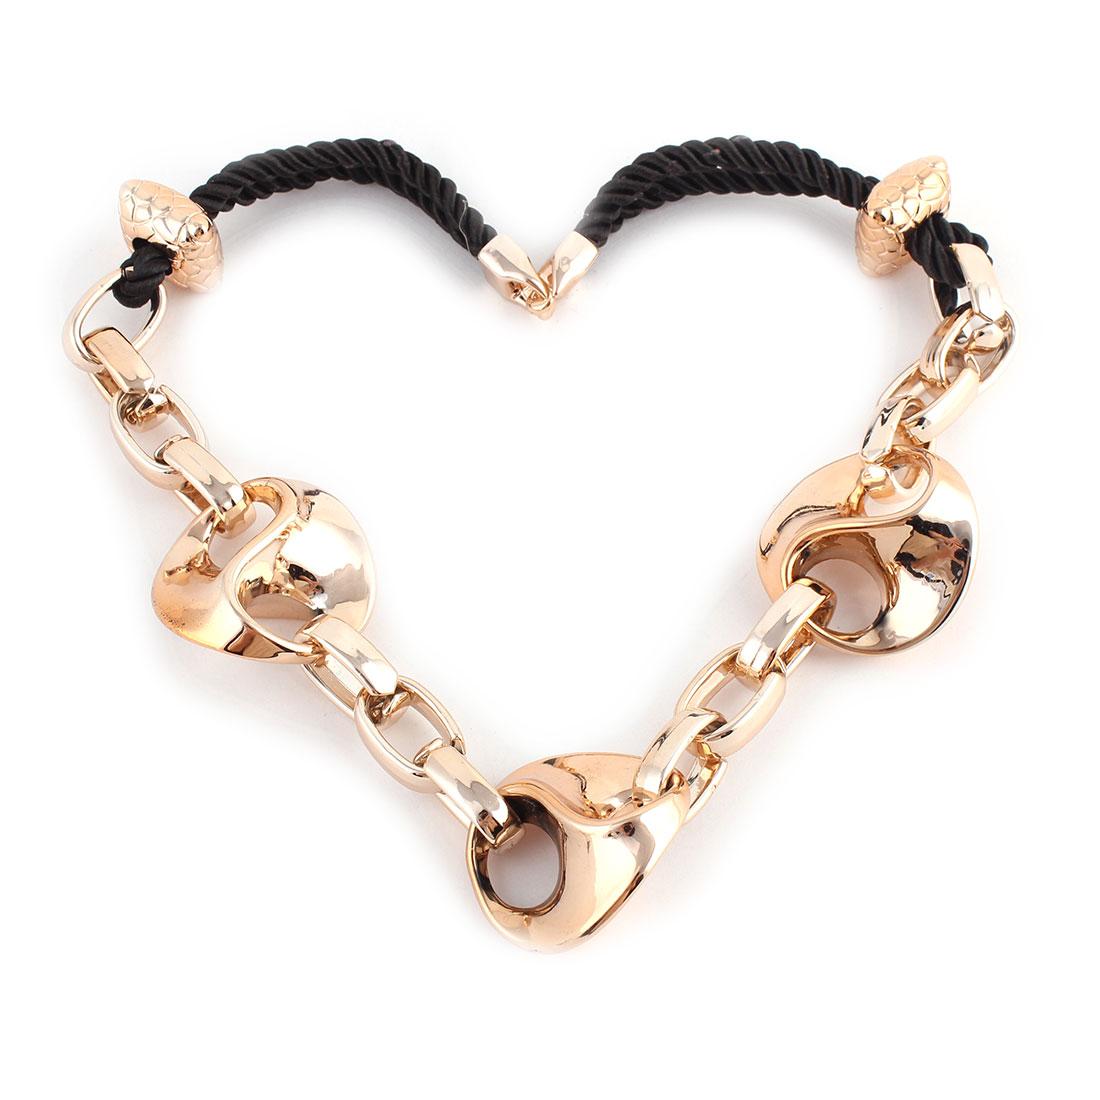 Woman Plastic Pendant Sweater Necklace Chain Party Ornament Gold Tone Black